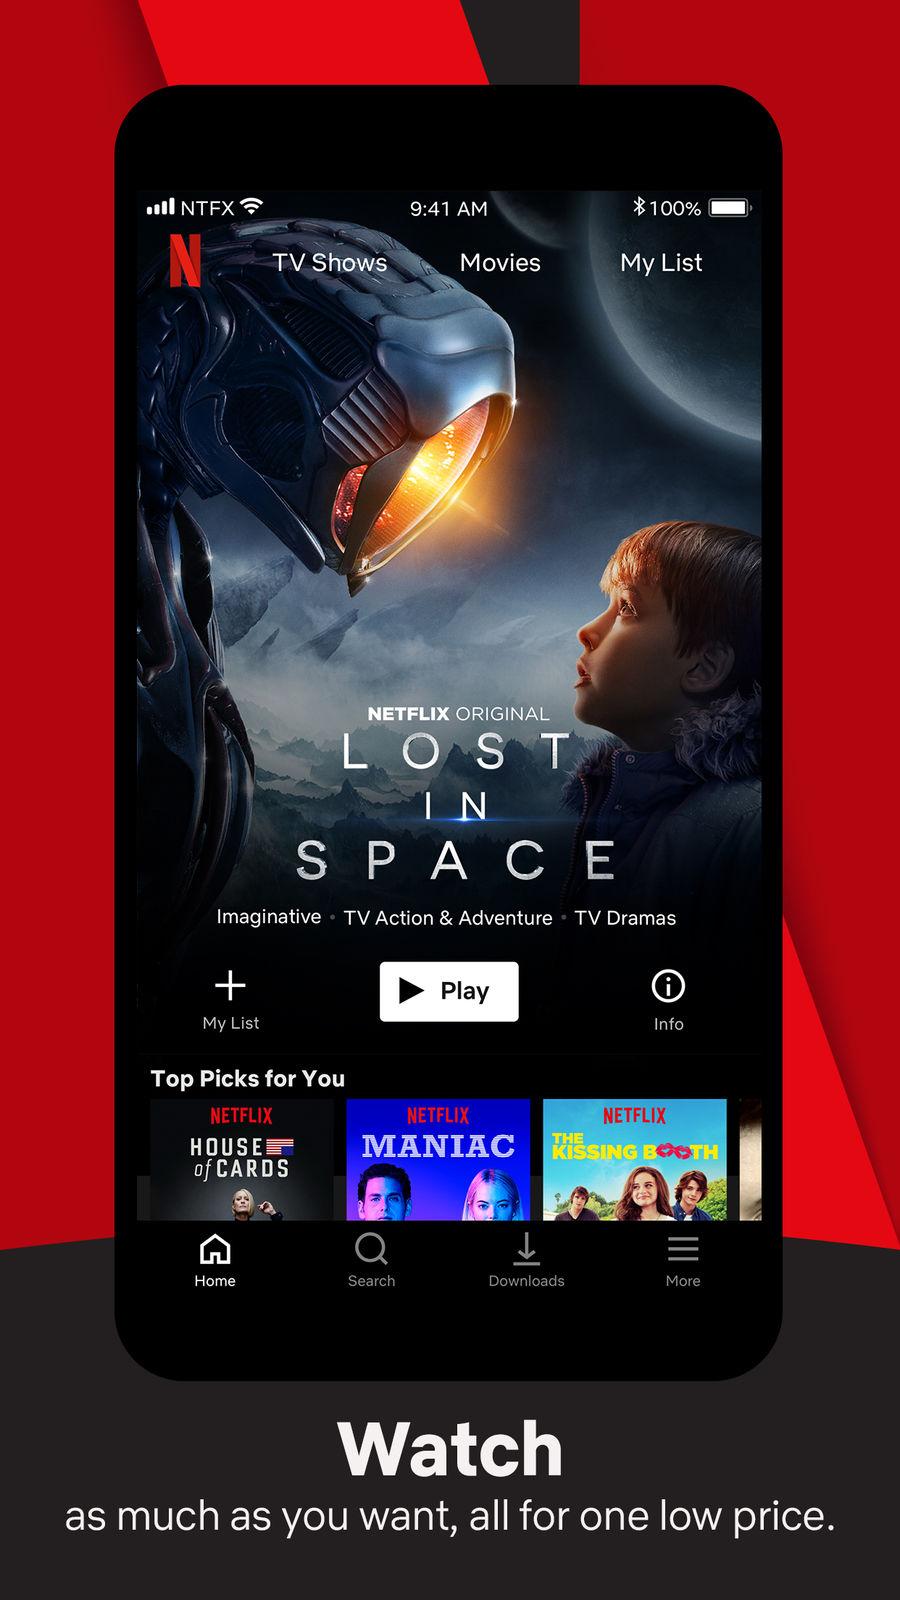 Netflix: Appstore Screenshots of Entertainment | Appstore Screenshots |  Waveguide.io